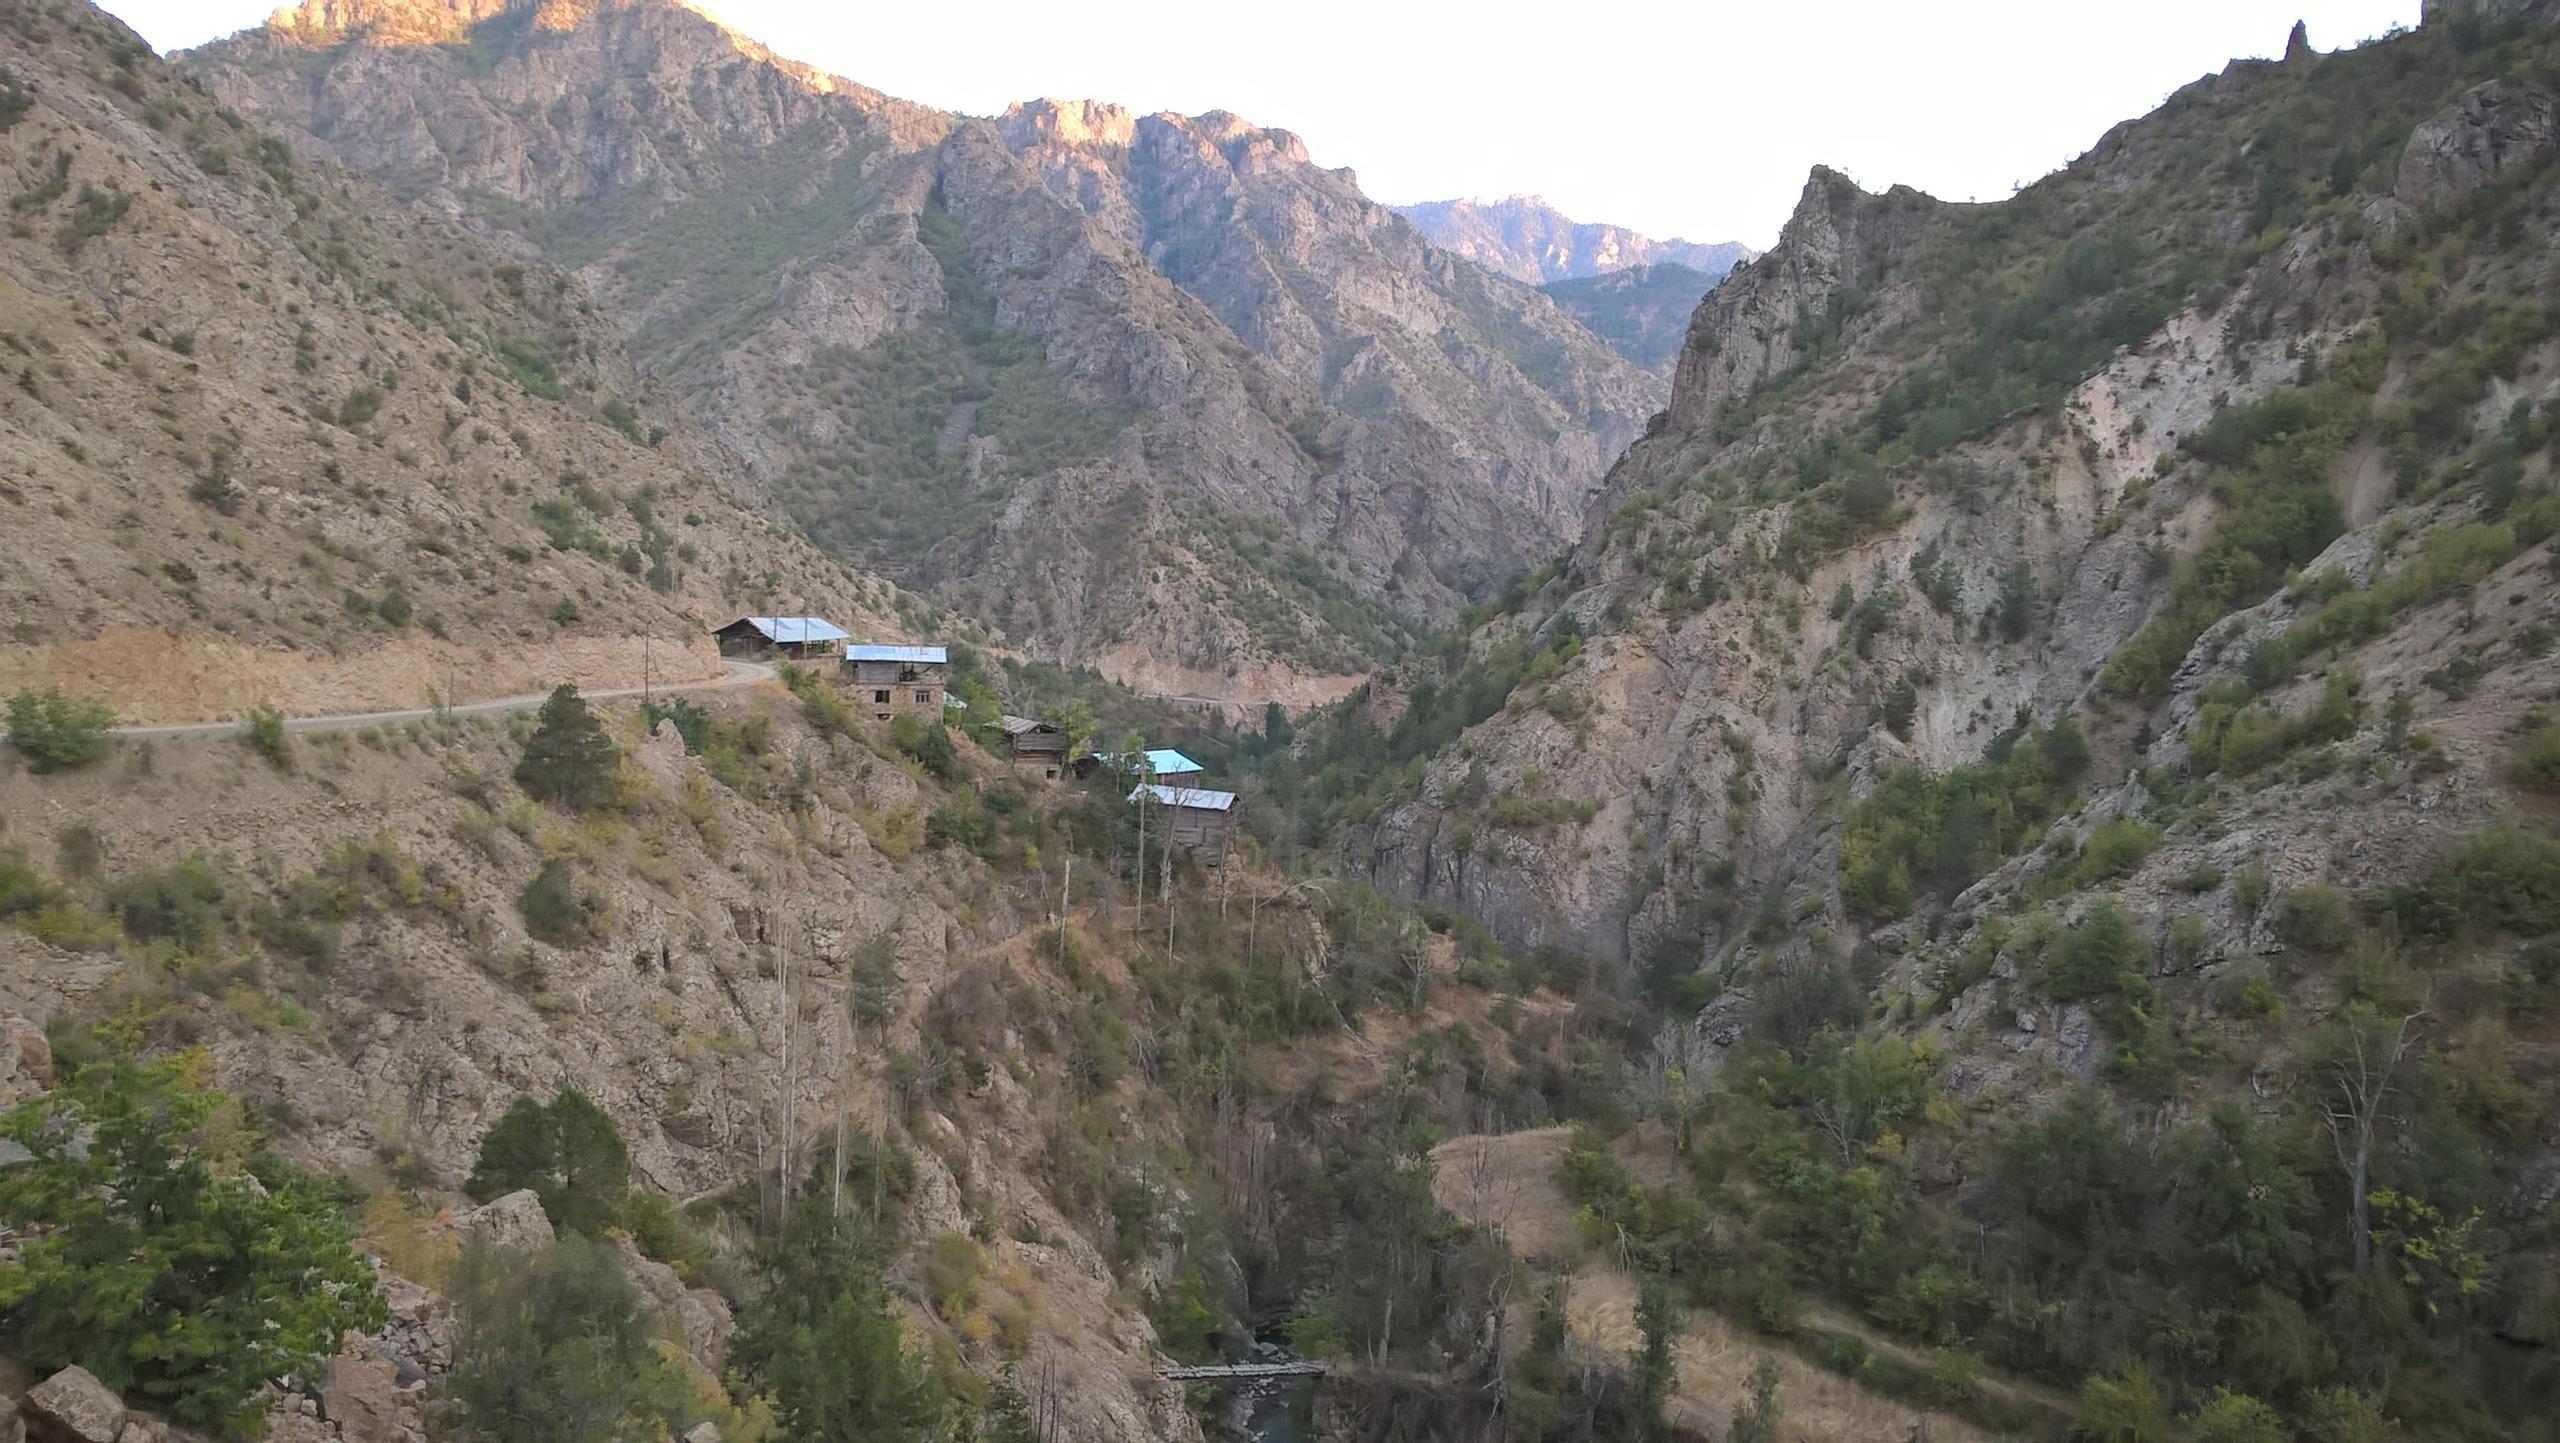 Каньон в районе Юсуфели и по пути в Балалан